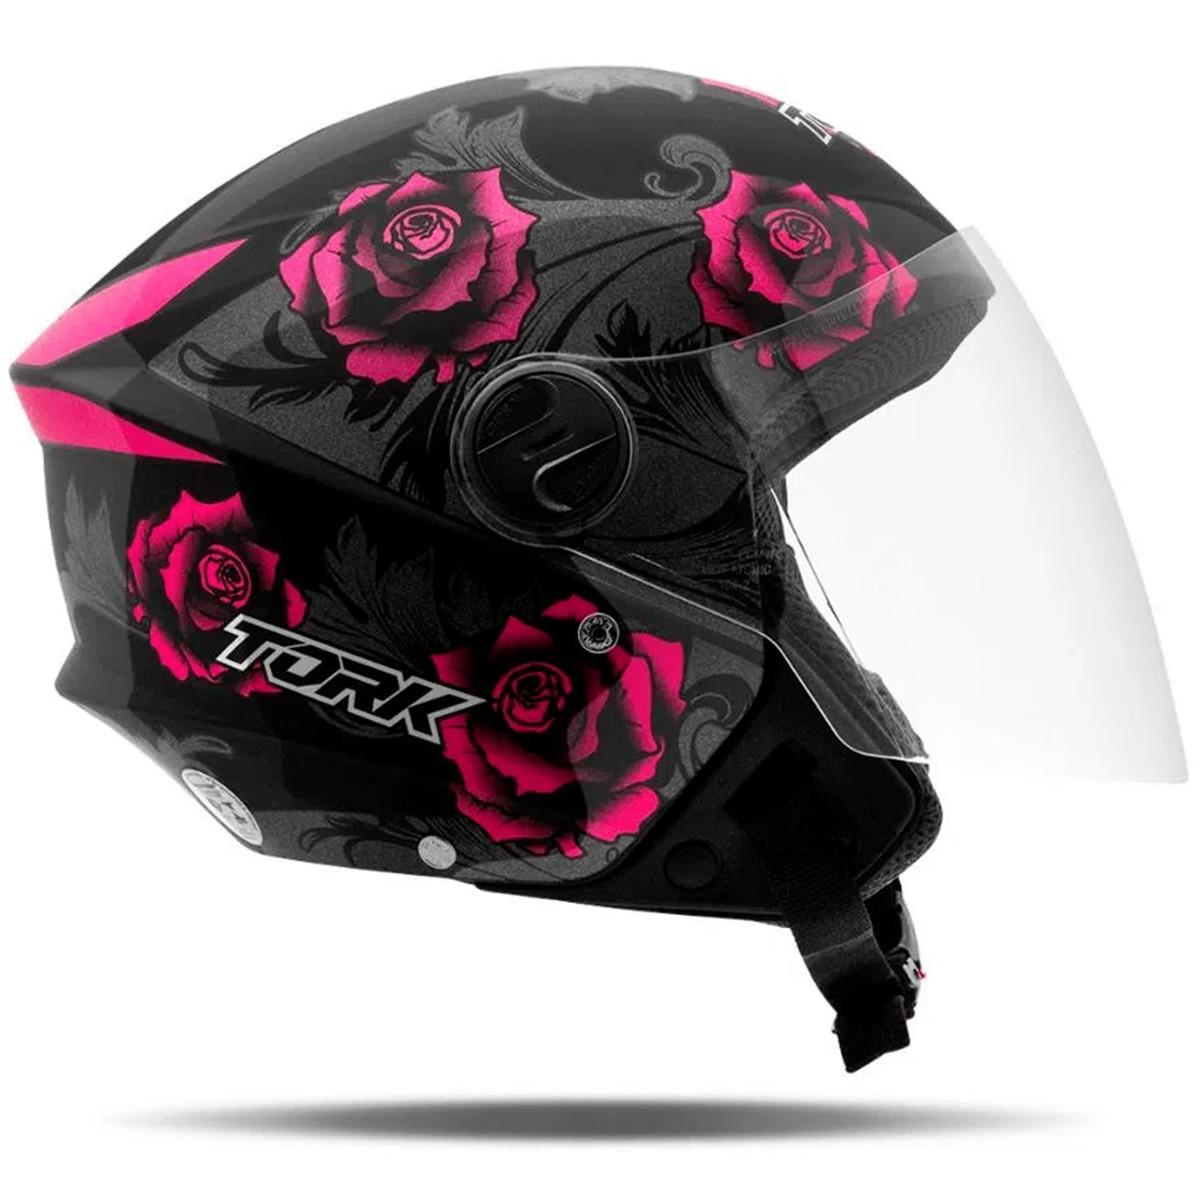 Capacete Moto Aberto ProTork New Liberty 3 Flowers